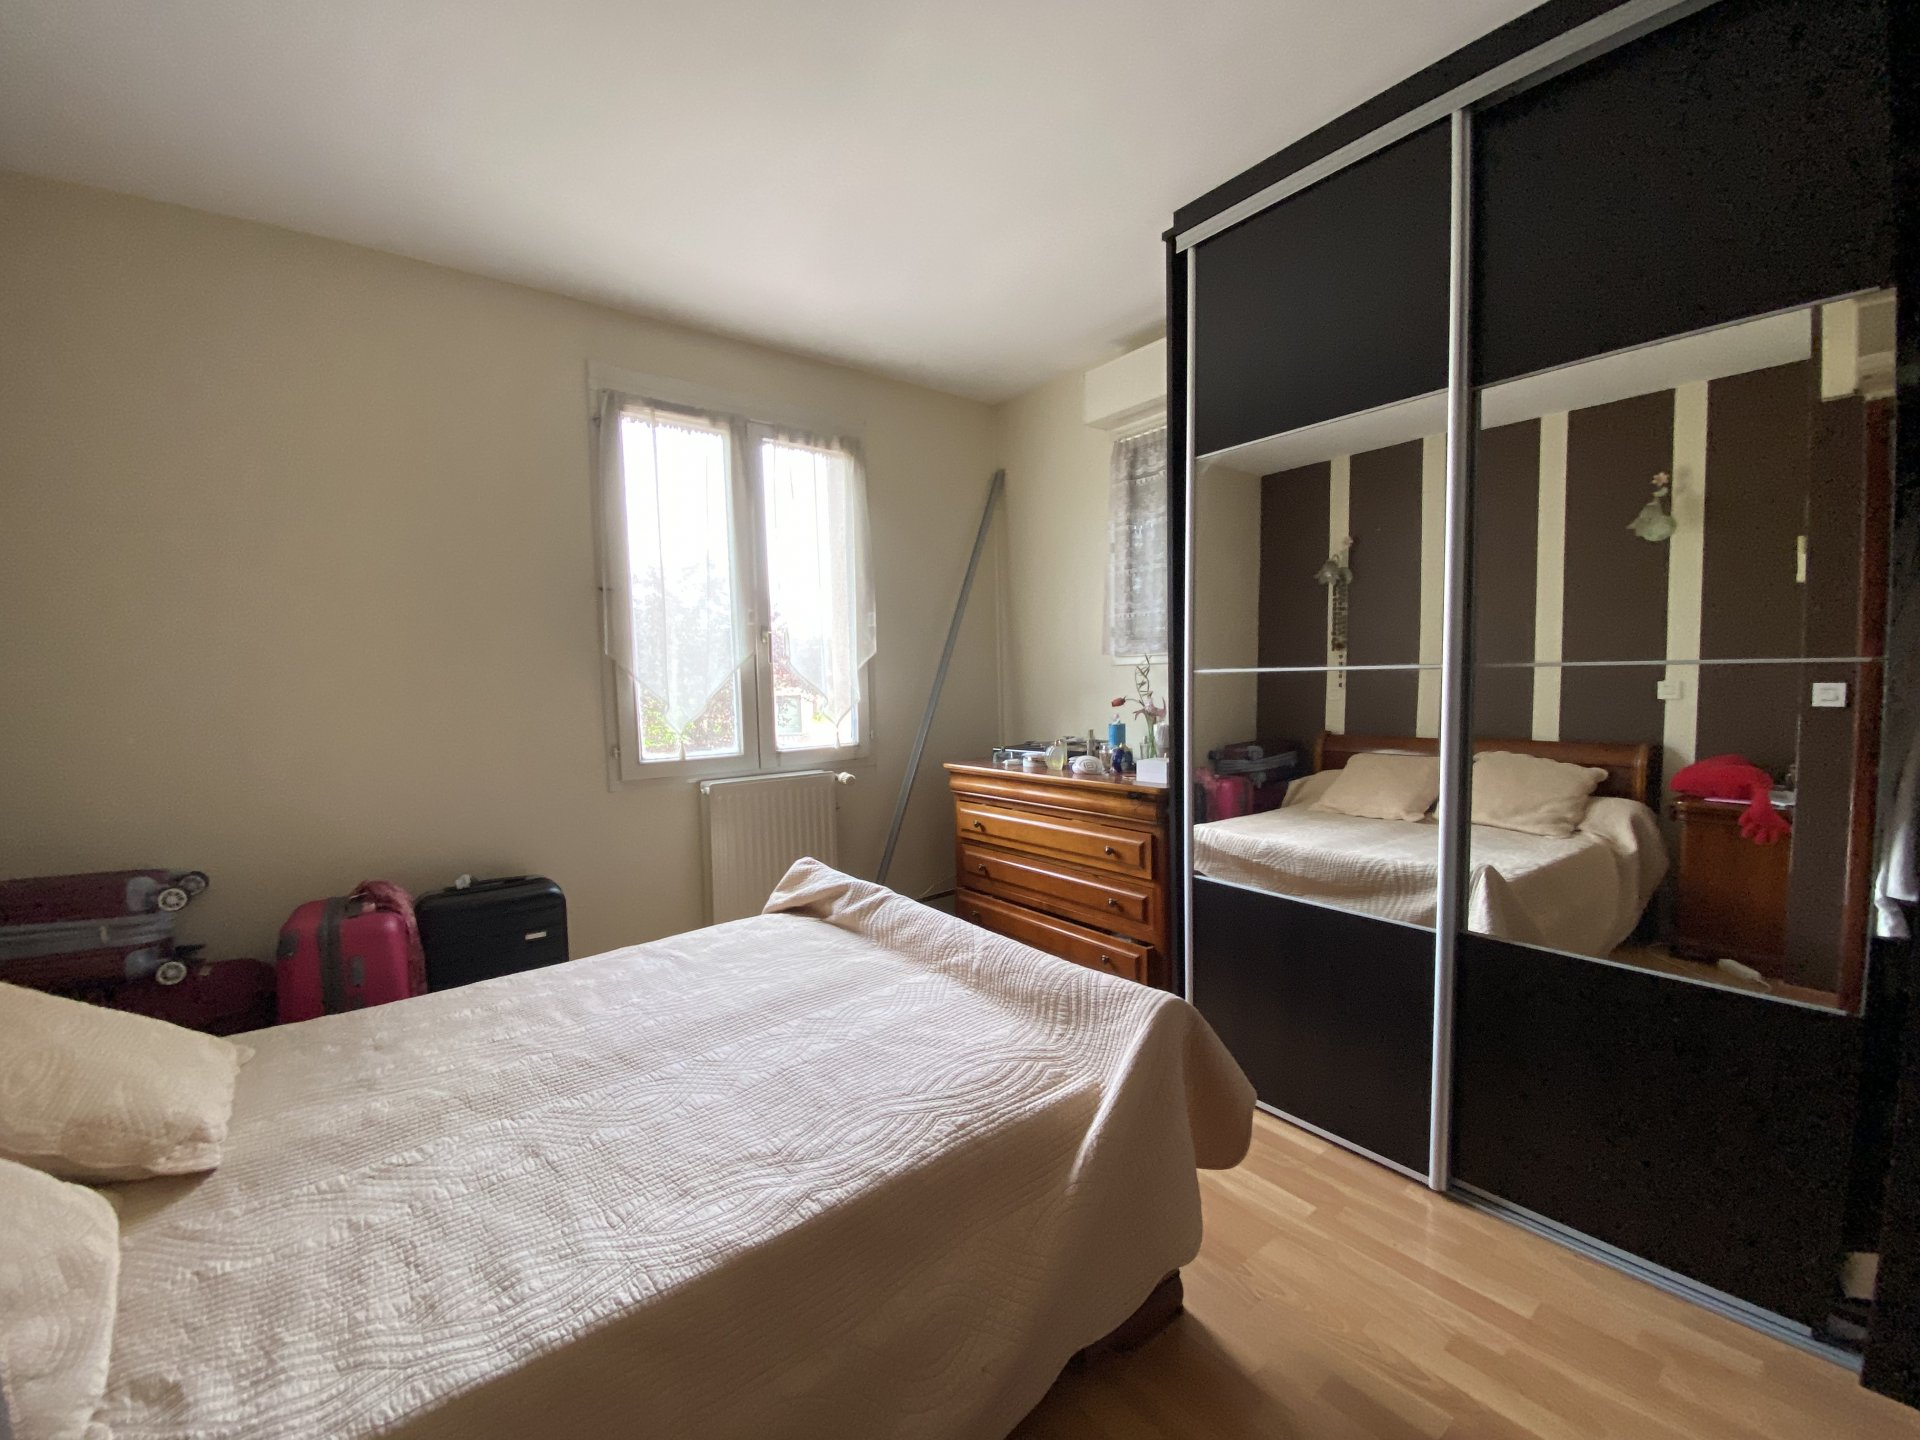 Venta Casa - Villeneuve-Tolosane